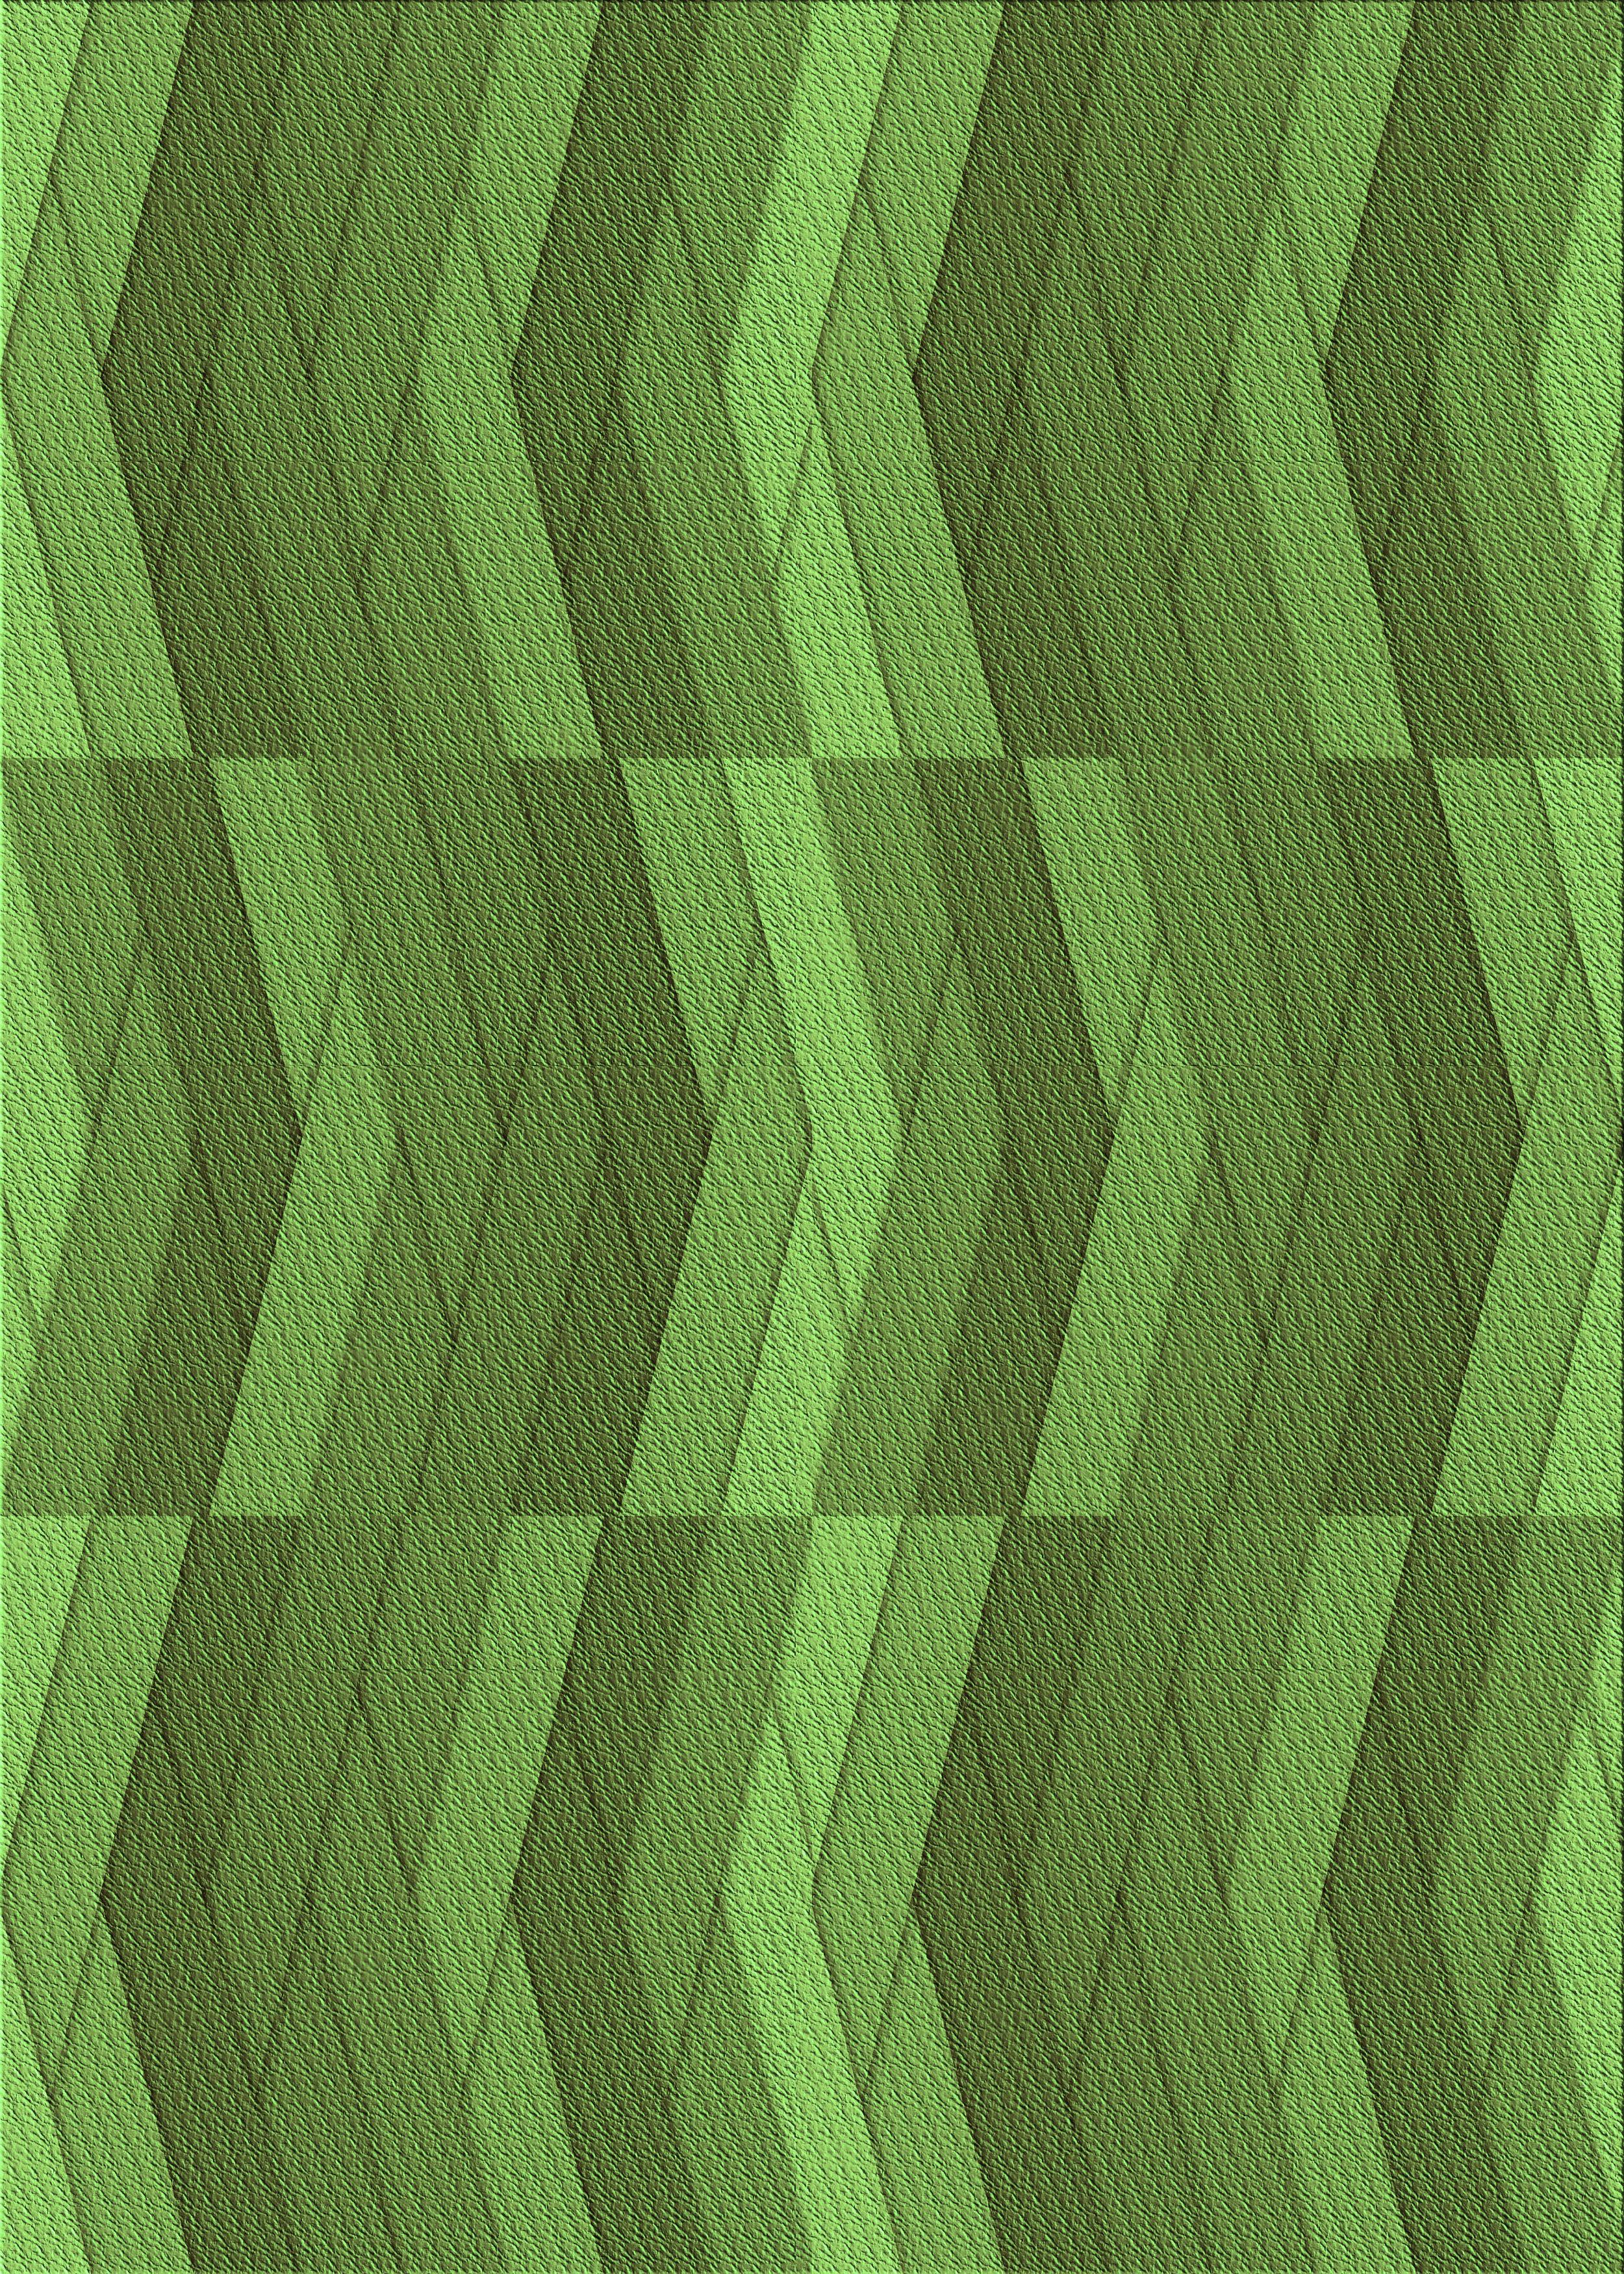 East Urban Home Chevron Wool Green Area Rug Wayfair